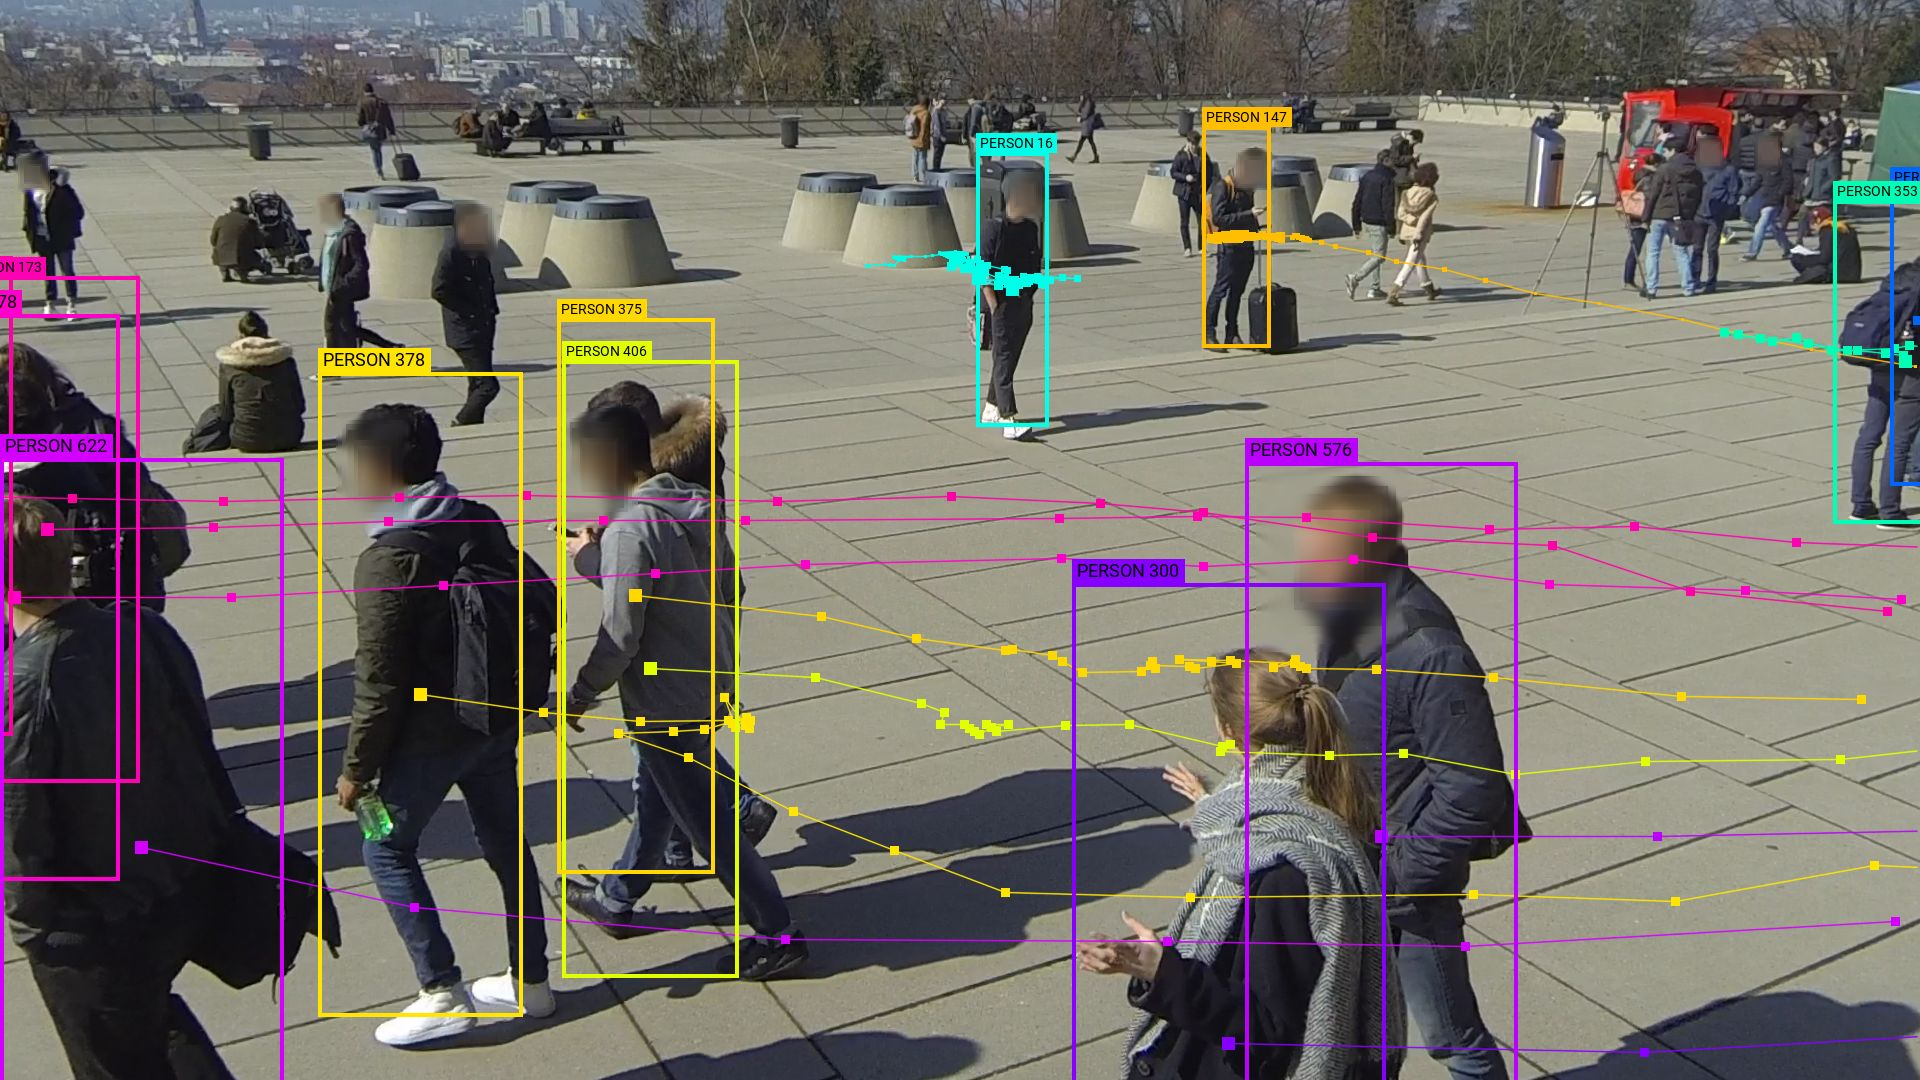 WILDTRACK camera 4. Original image from WILDTRACK dataset by Chavdarova et al. (2017). Data visualization by Adam Harvey / megapixels.cc (2020)